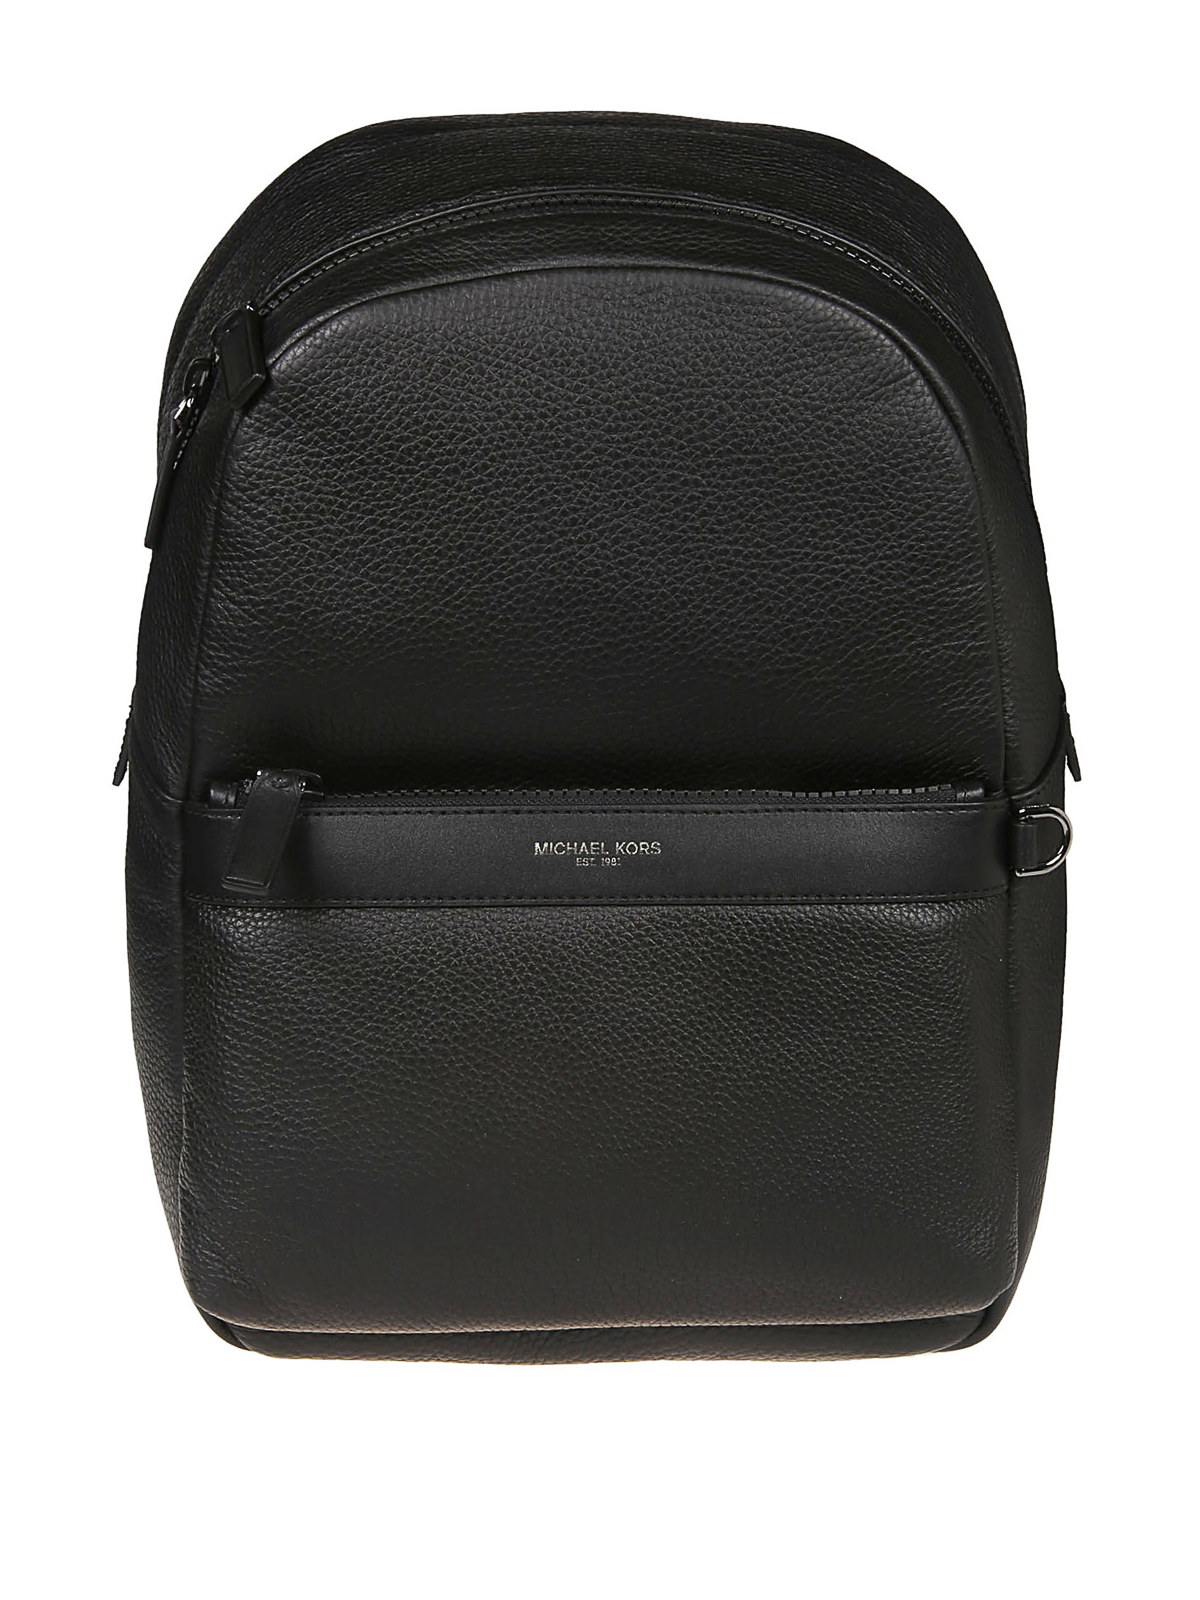 4994585a707575 Michael Kors - Greyson black pebble leather backpack - backpacks ...